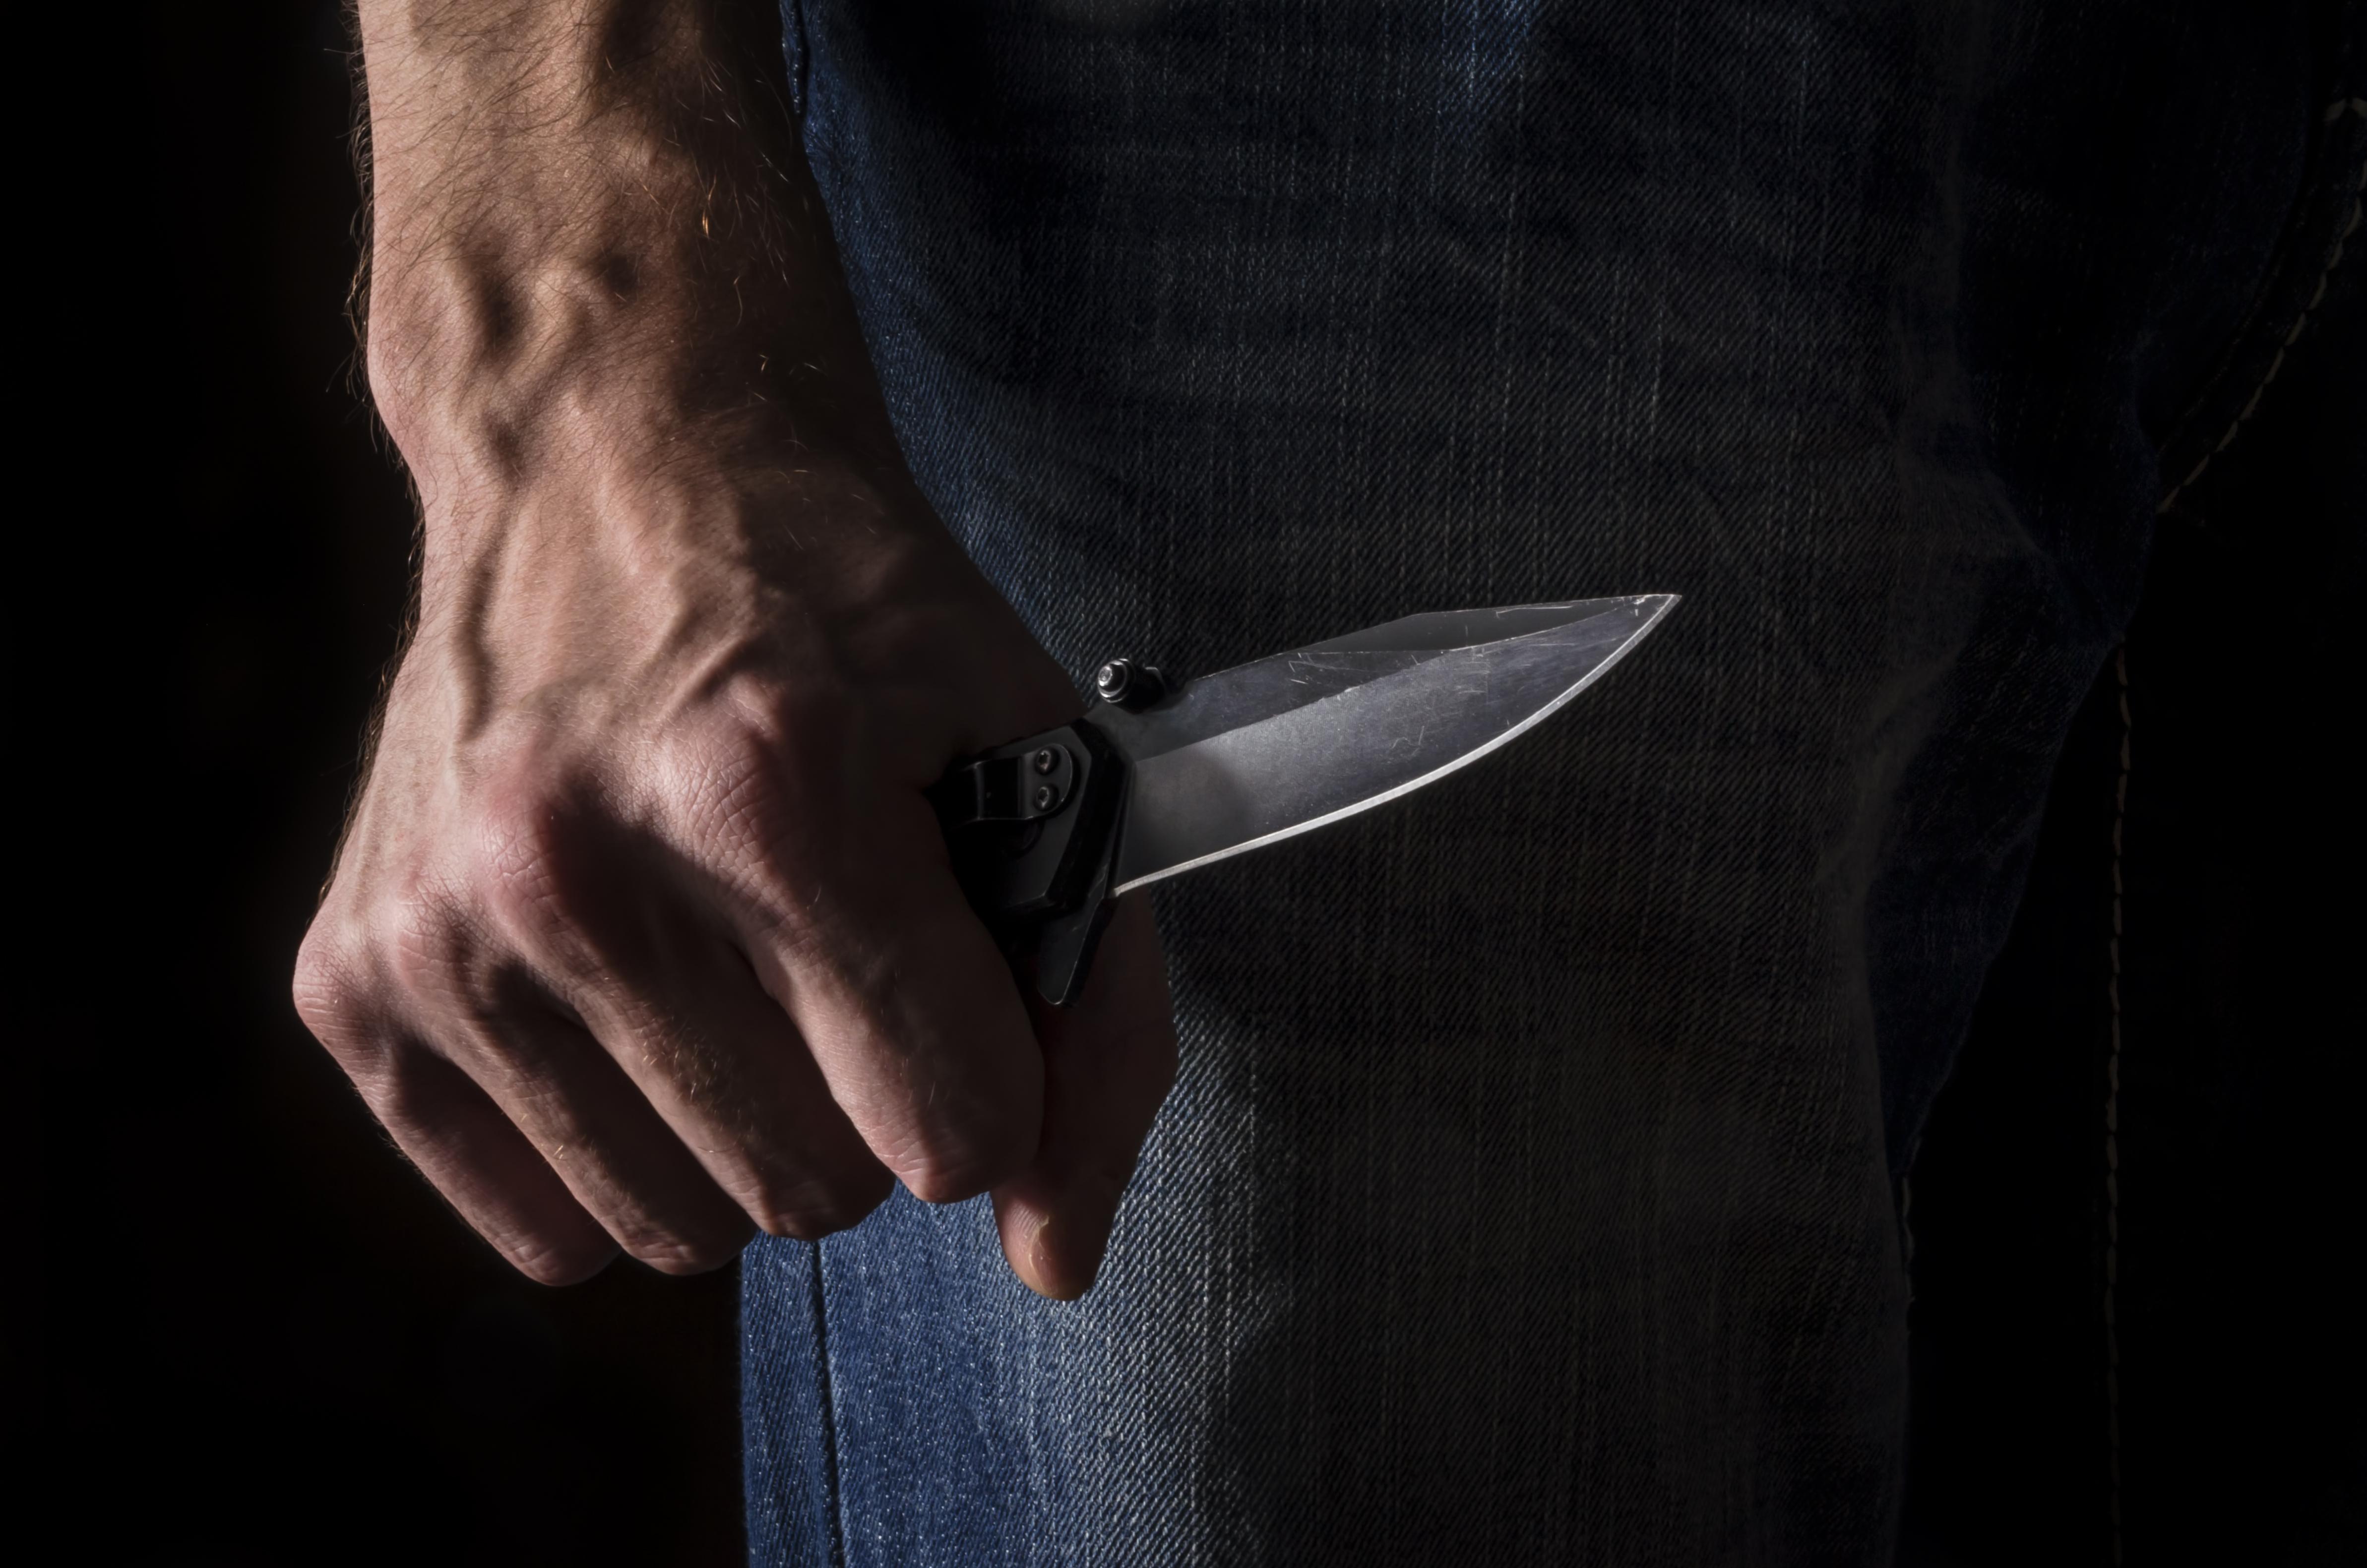 Photo of פוענח הרצח של תושב תלפיות בירושלים: בגלל ויכוח סתמי החשוד ברצח שב לביתו, נטל סכין ודקר למוות את מכרו